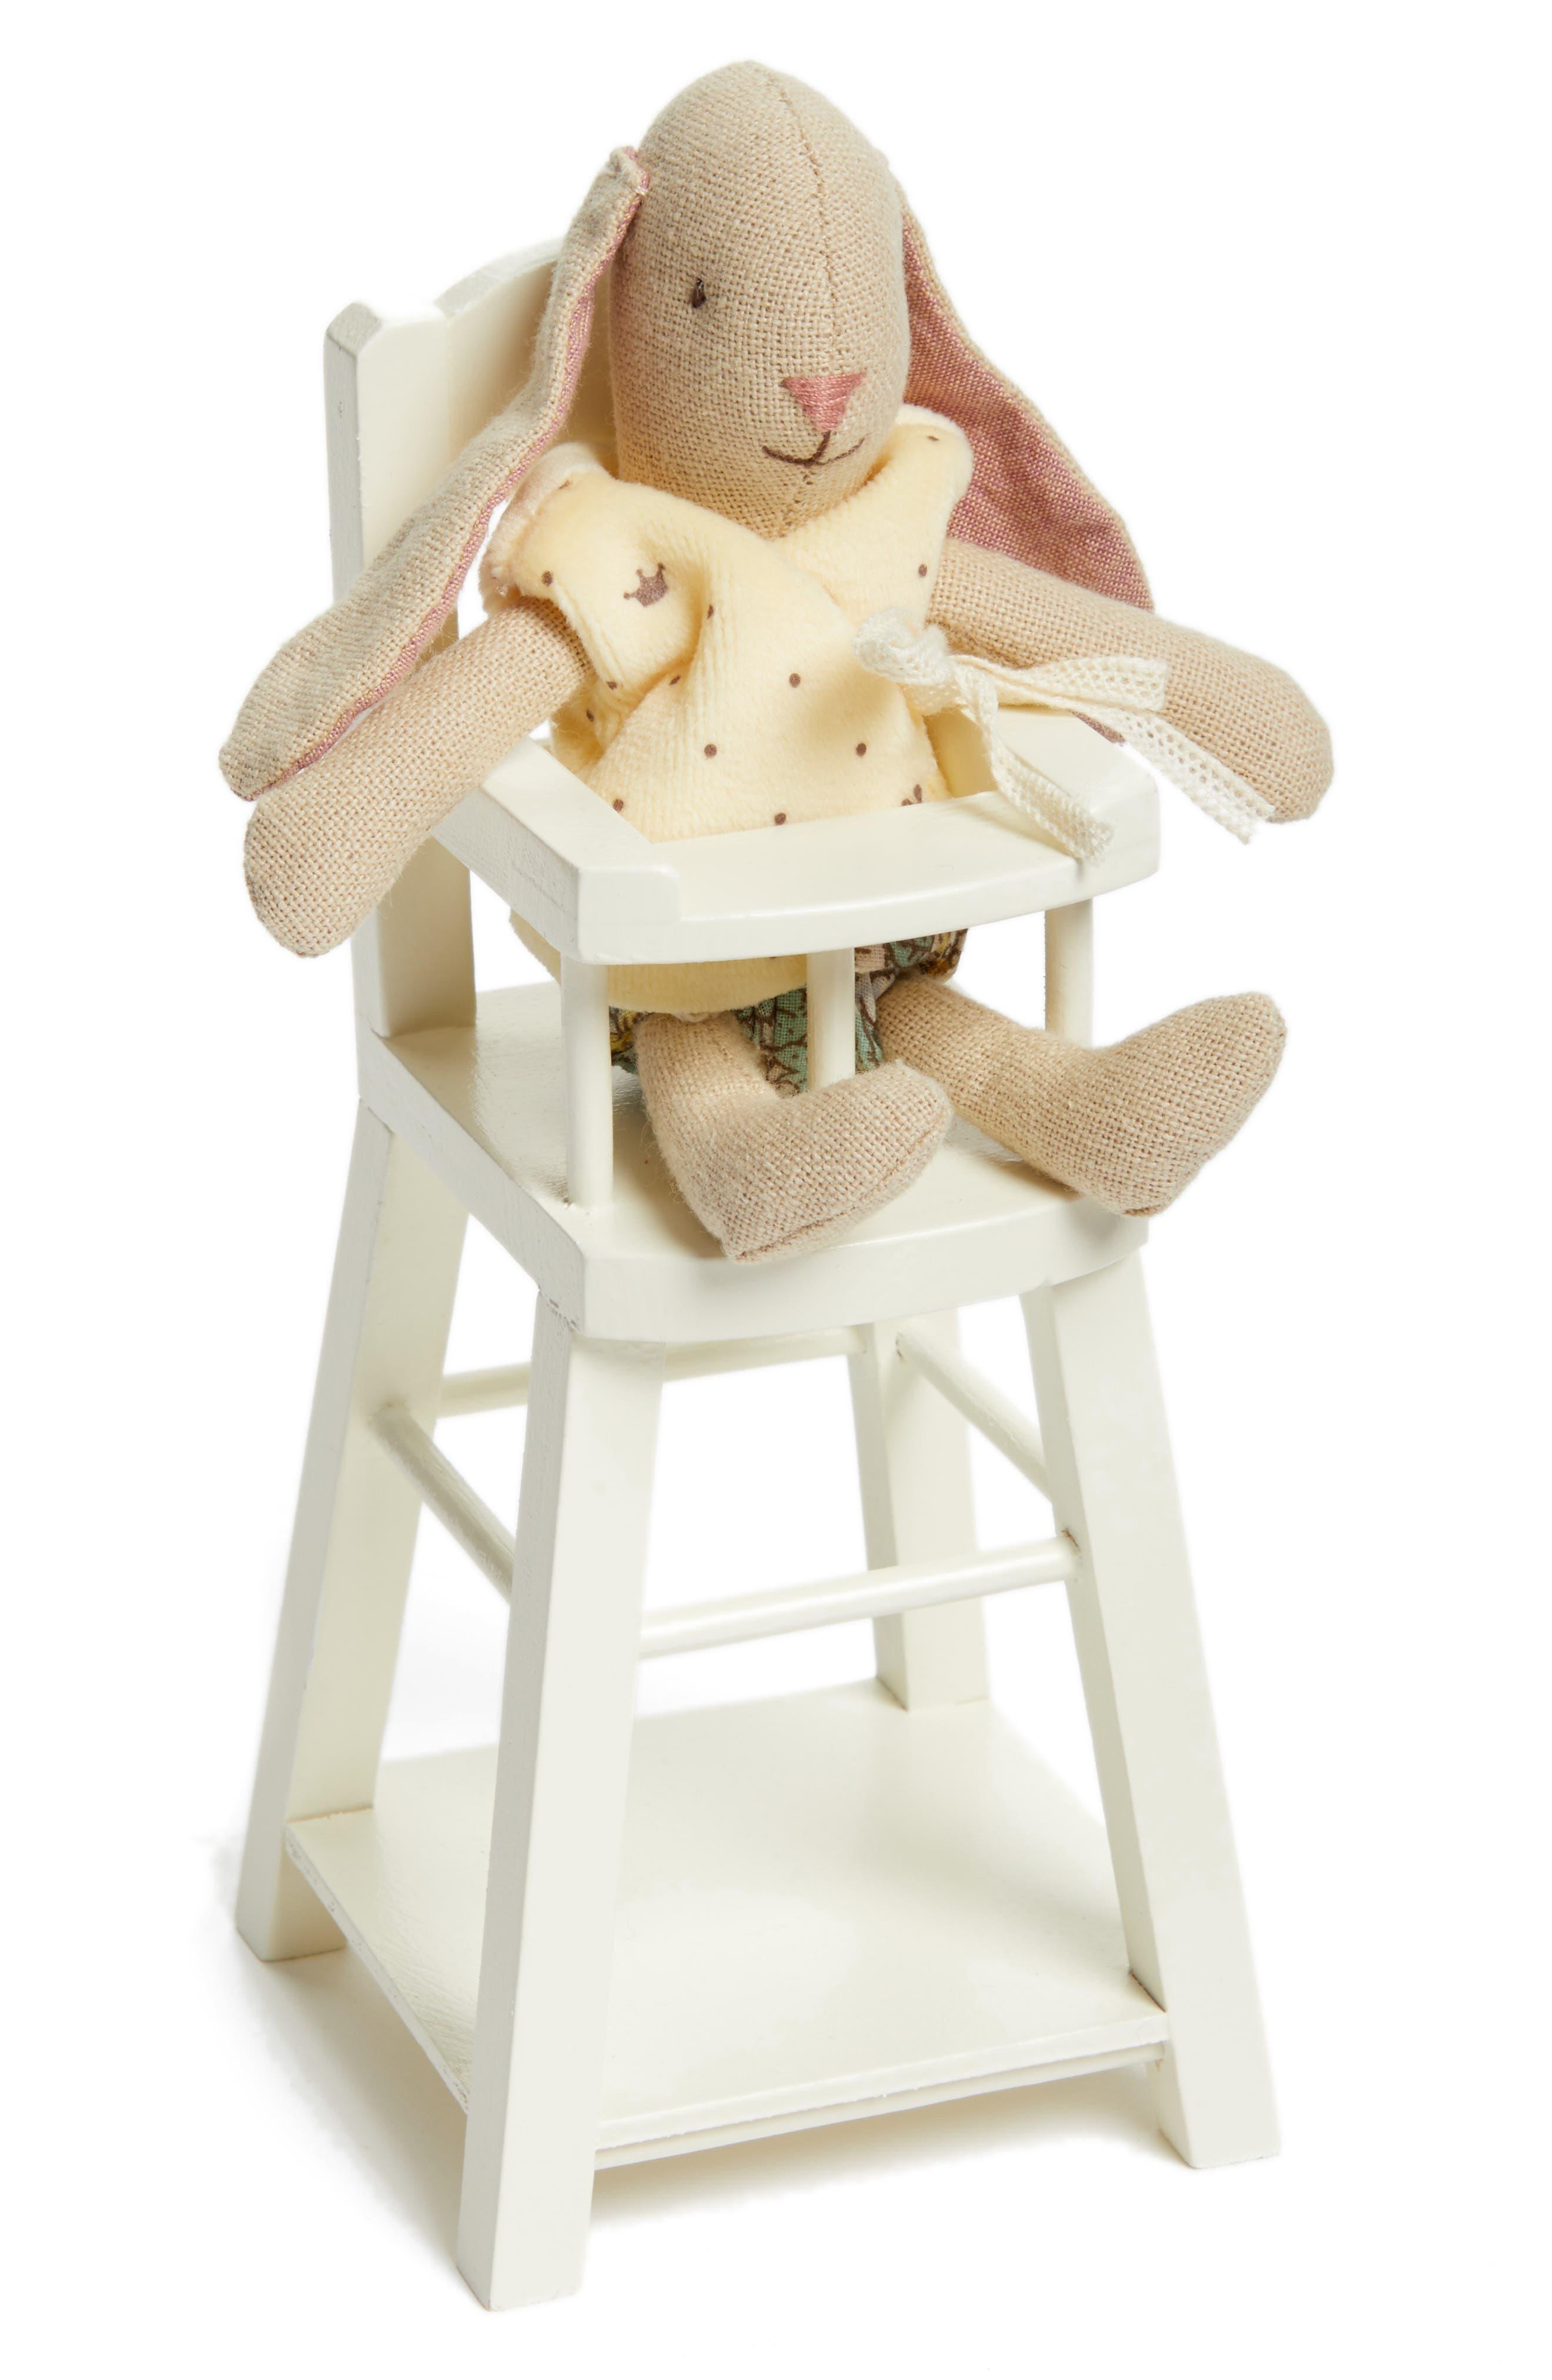 Micro Bunny Rabbit Stuffed Animal and Highchair,                         Main,                         color, 020